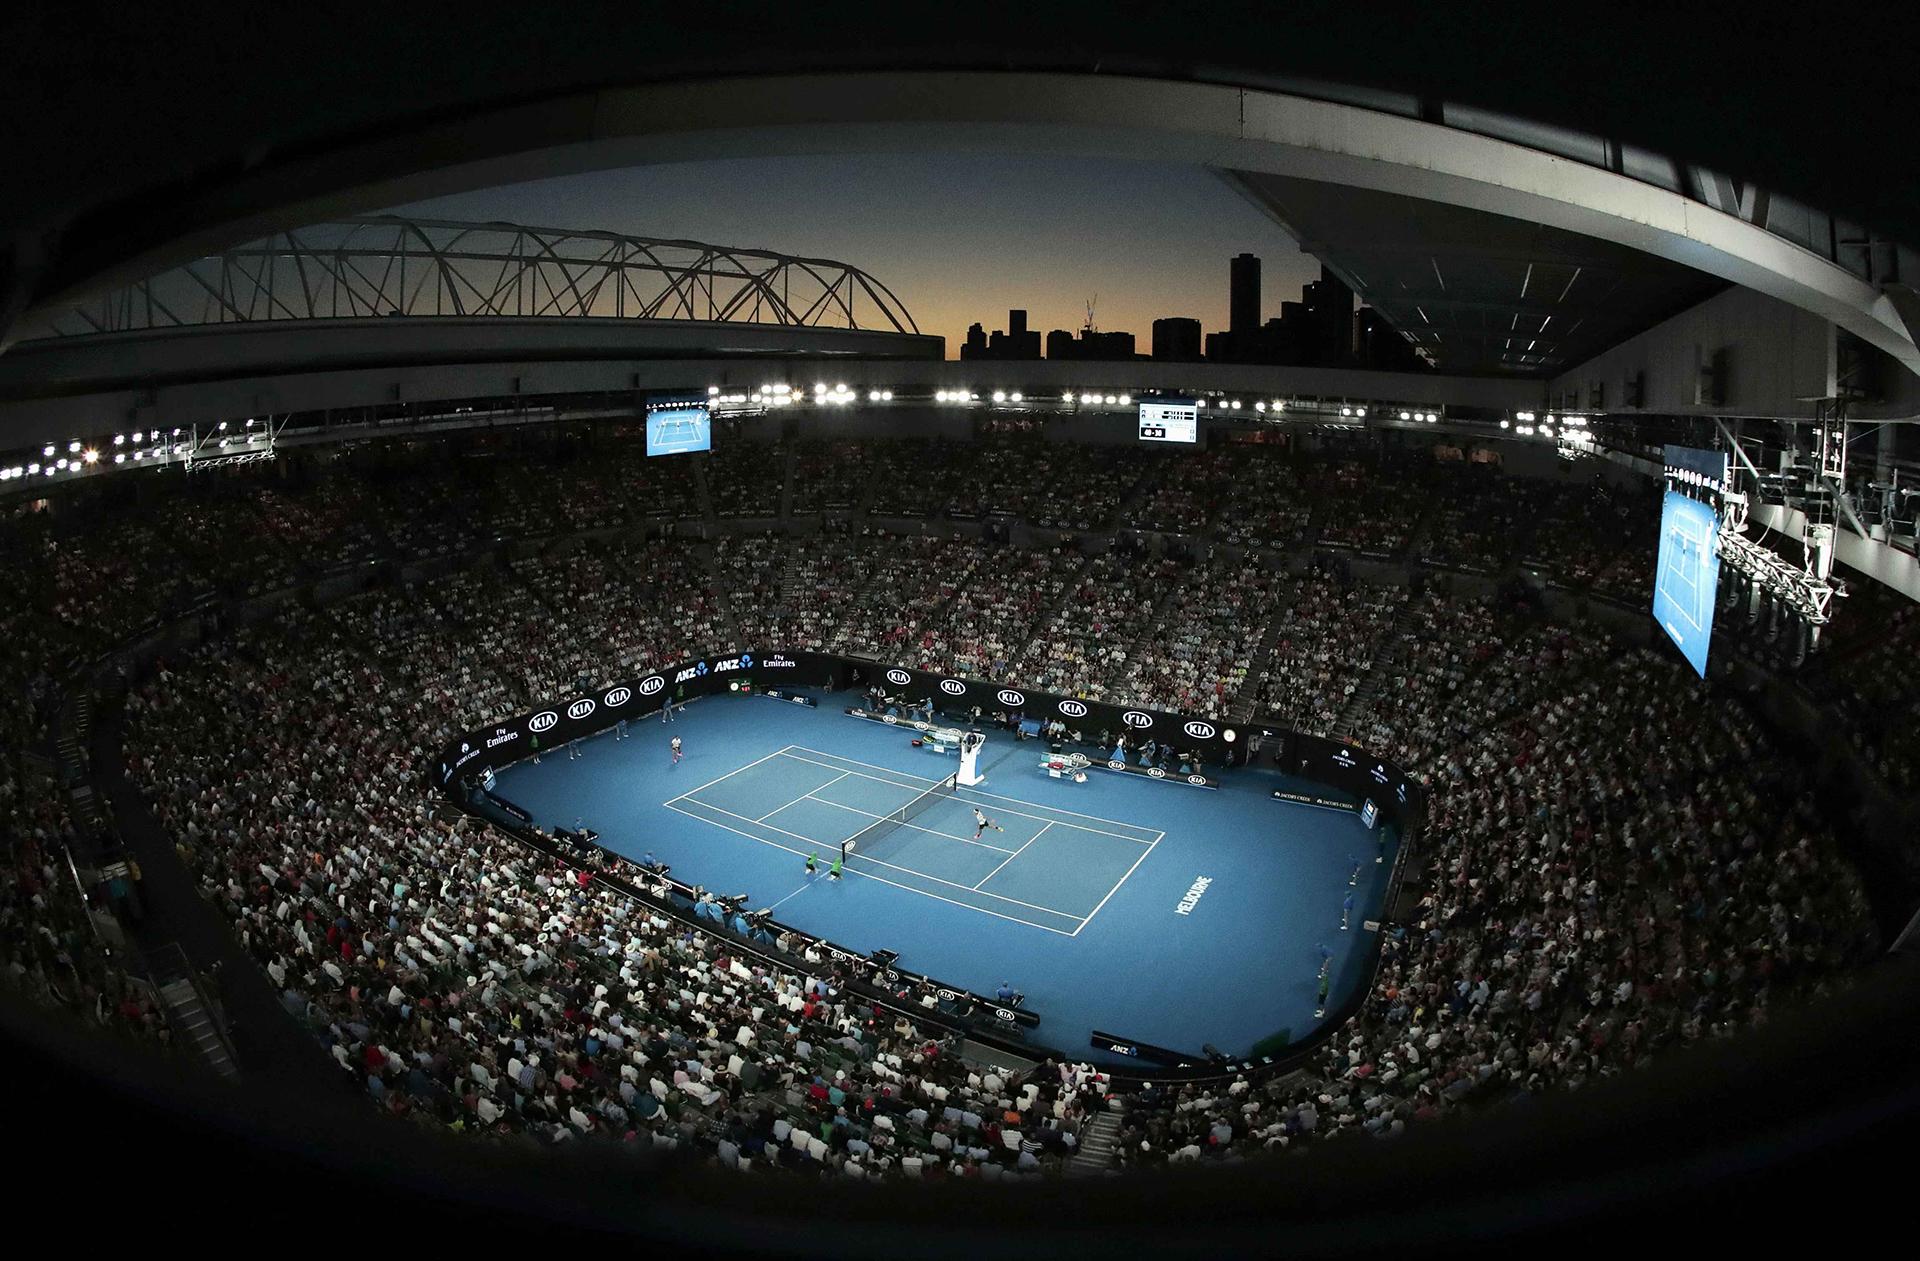 El Melbourne Park acogió la gran final enter Roger Federer y Rafael Nadal